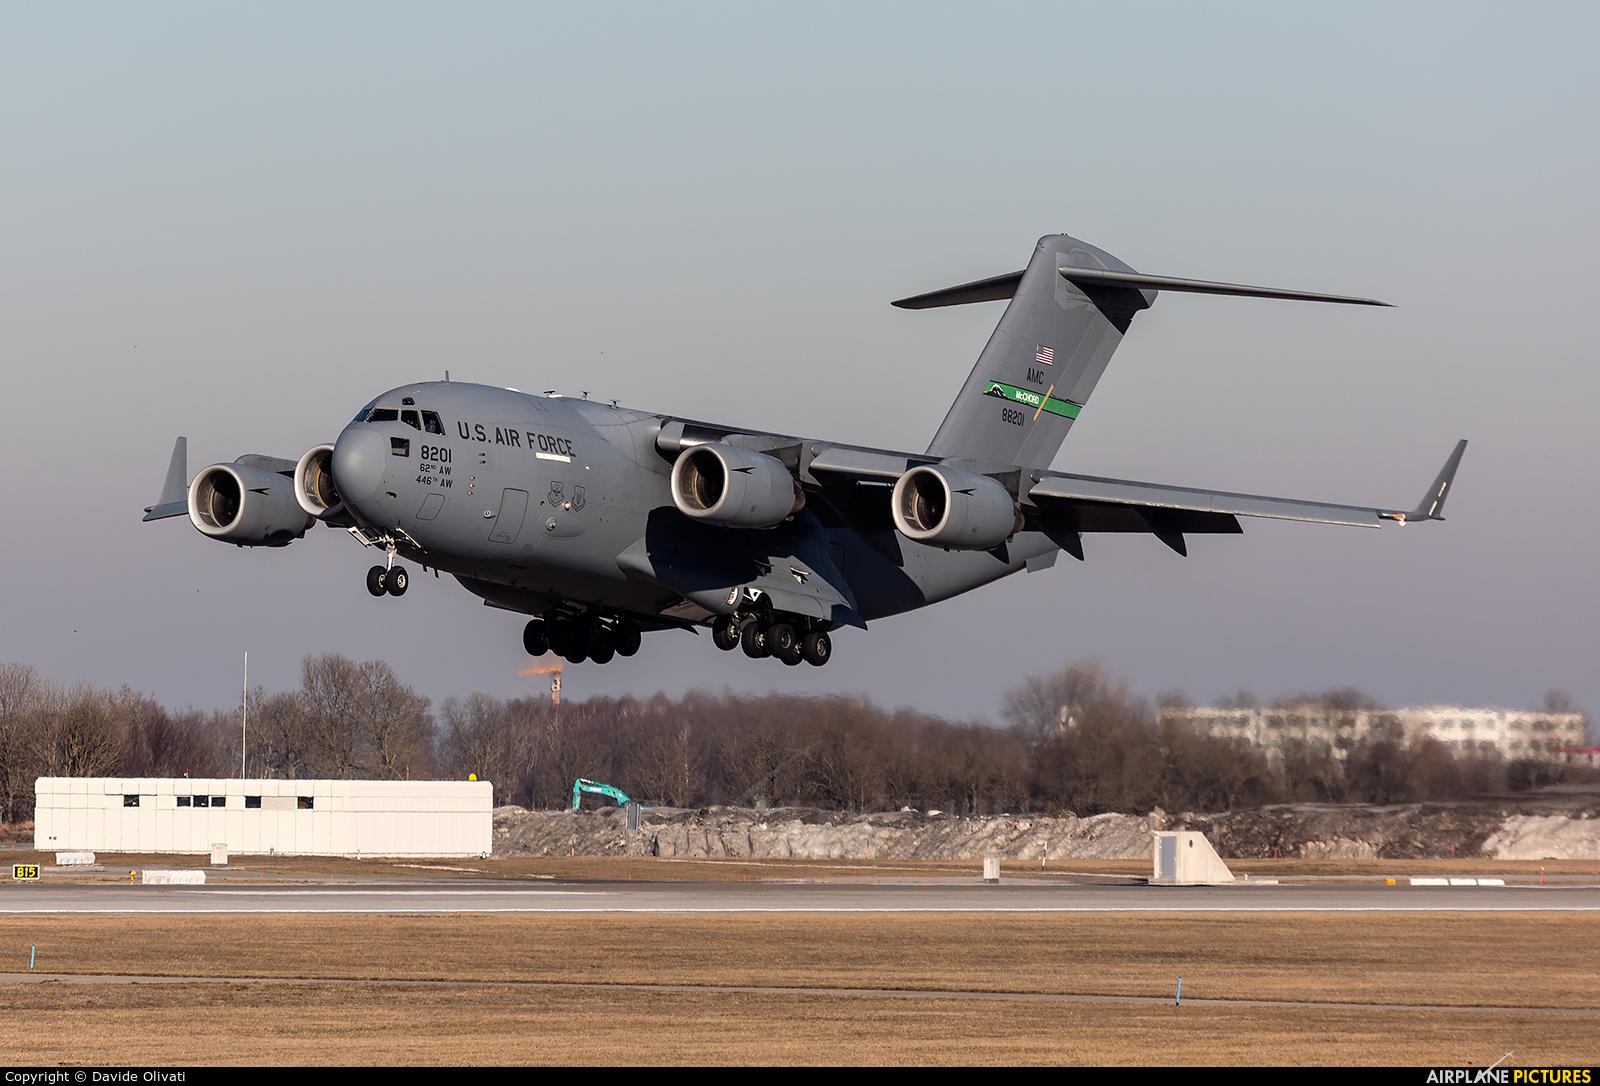 USA - Air Force 08-8201 aircraft at Munich